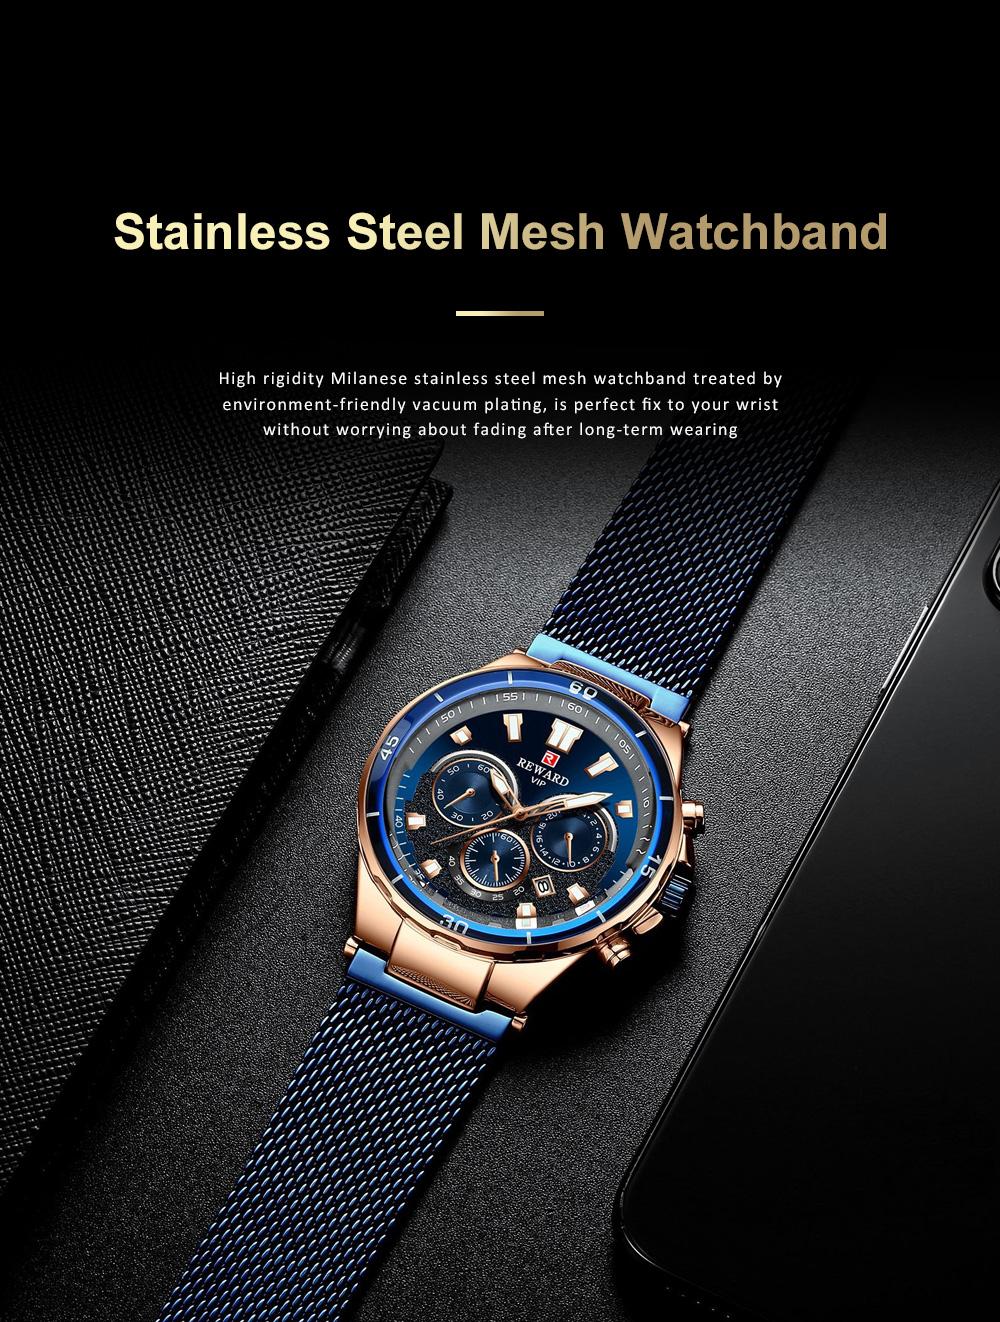 3 Dials Sports Quartz Watch with Adjustable Stainless Steel Watchband, Waterproof Fashion Accessories Wrist Watch for Men 6